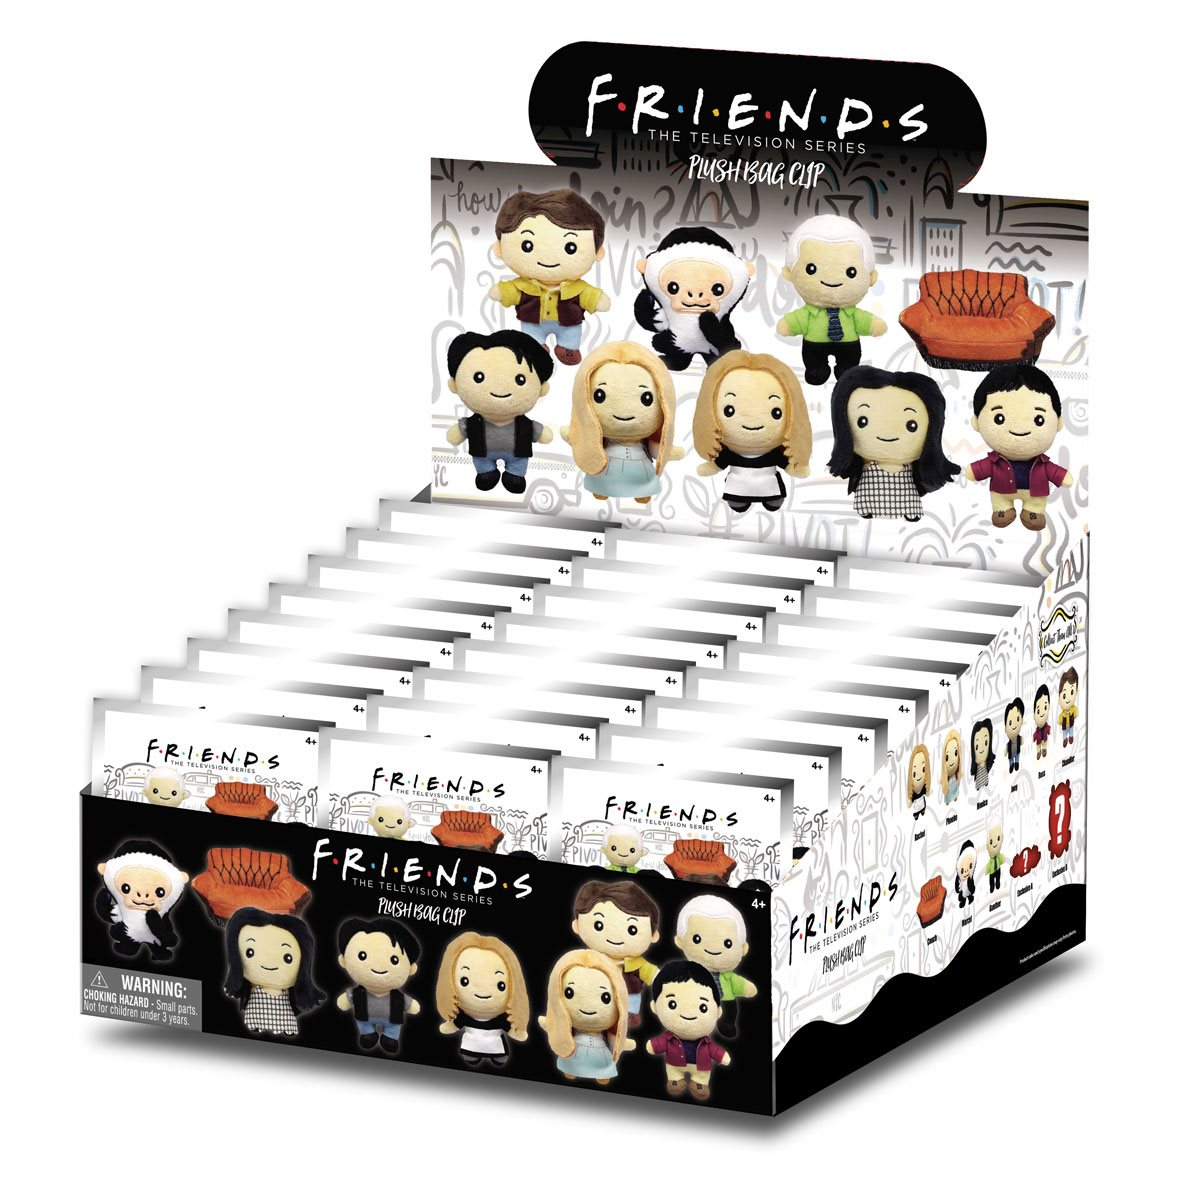 Friends The Television Series Plush Bag Clip Rachel